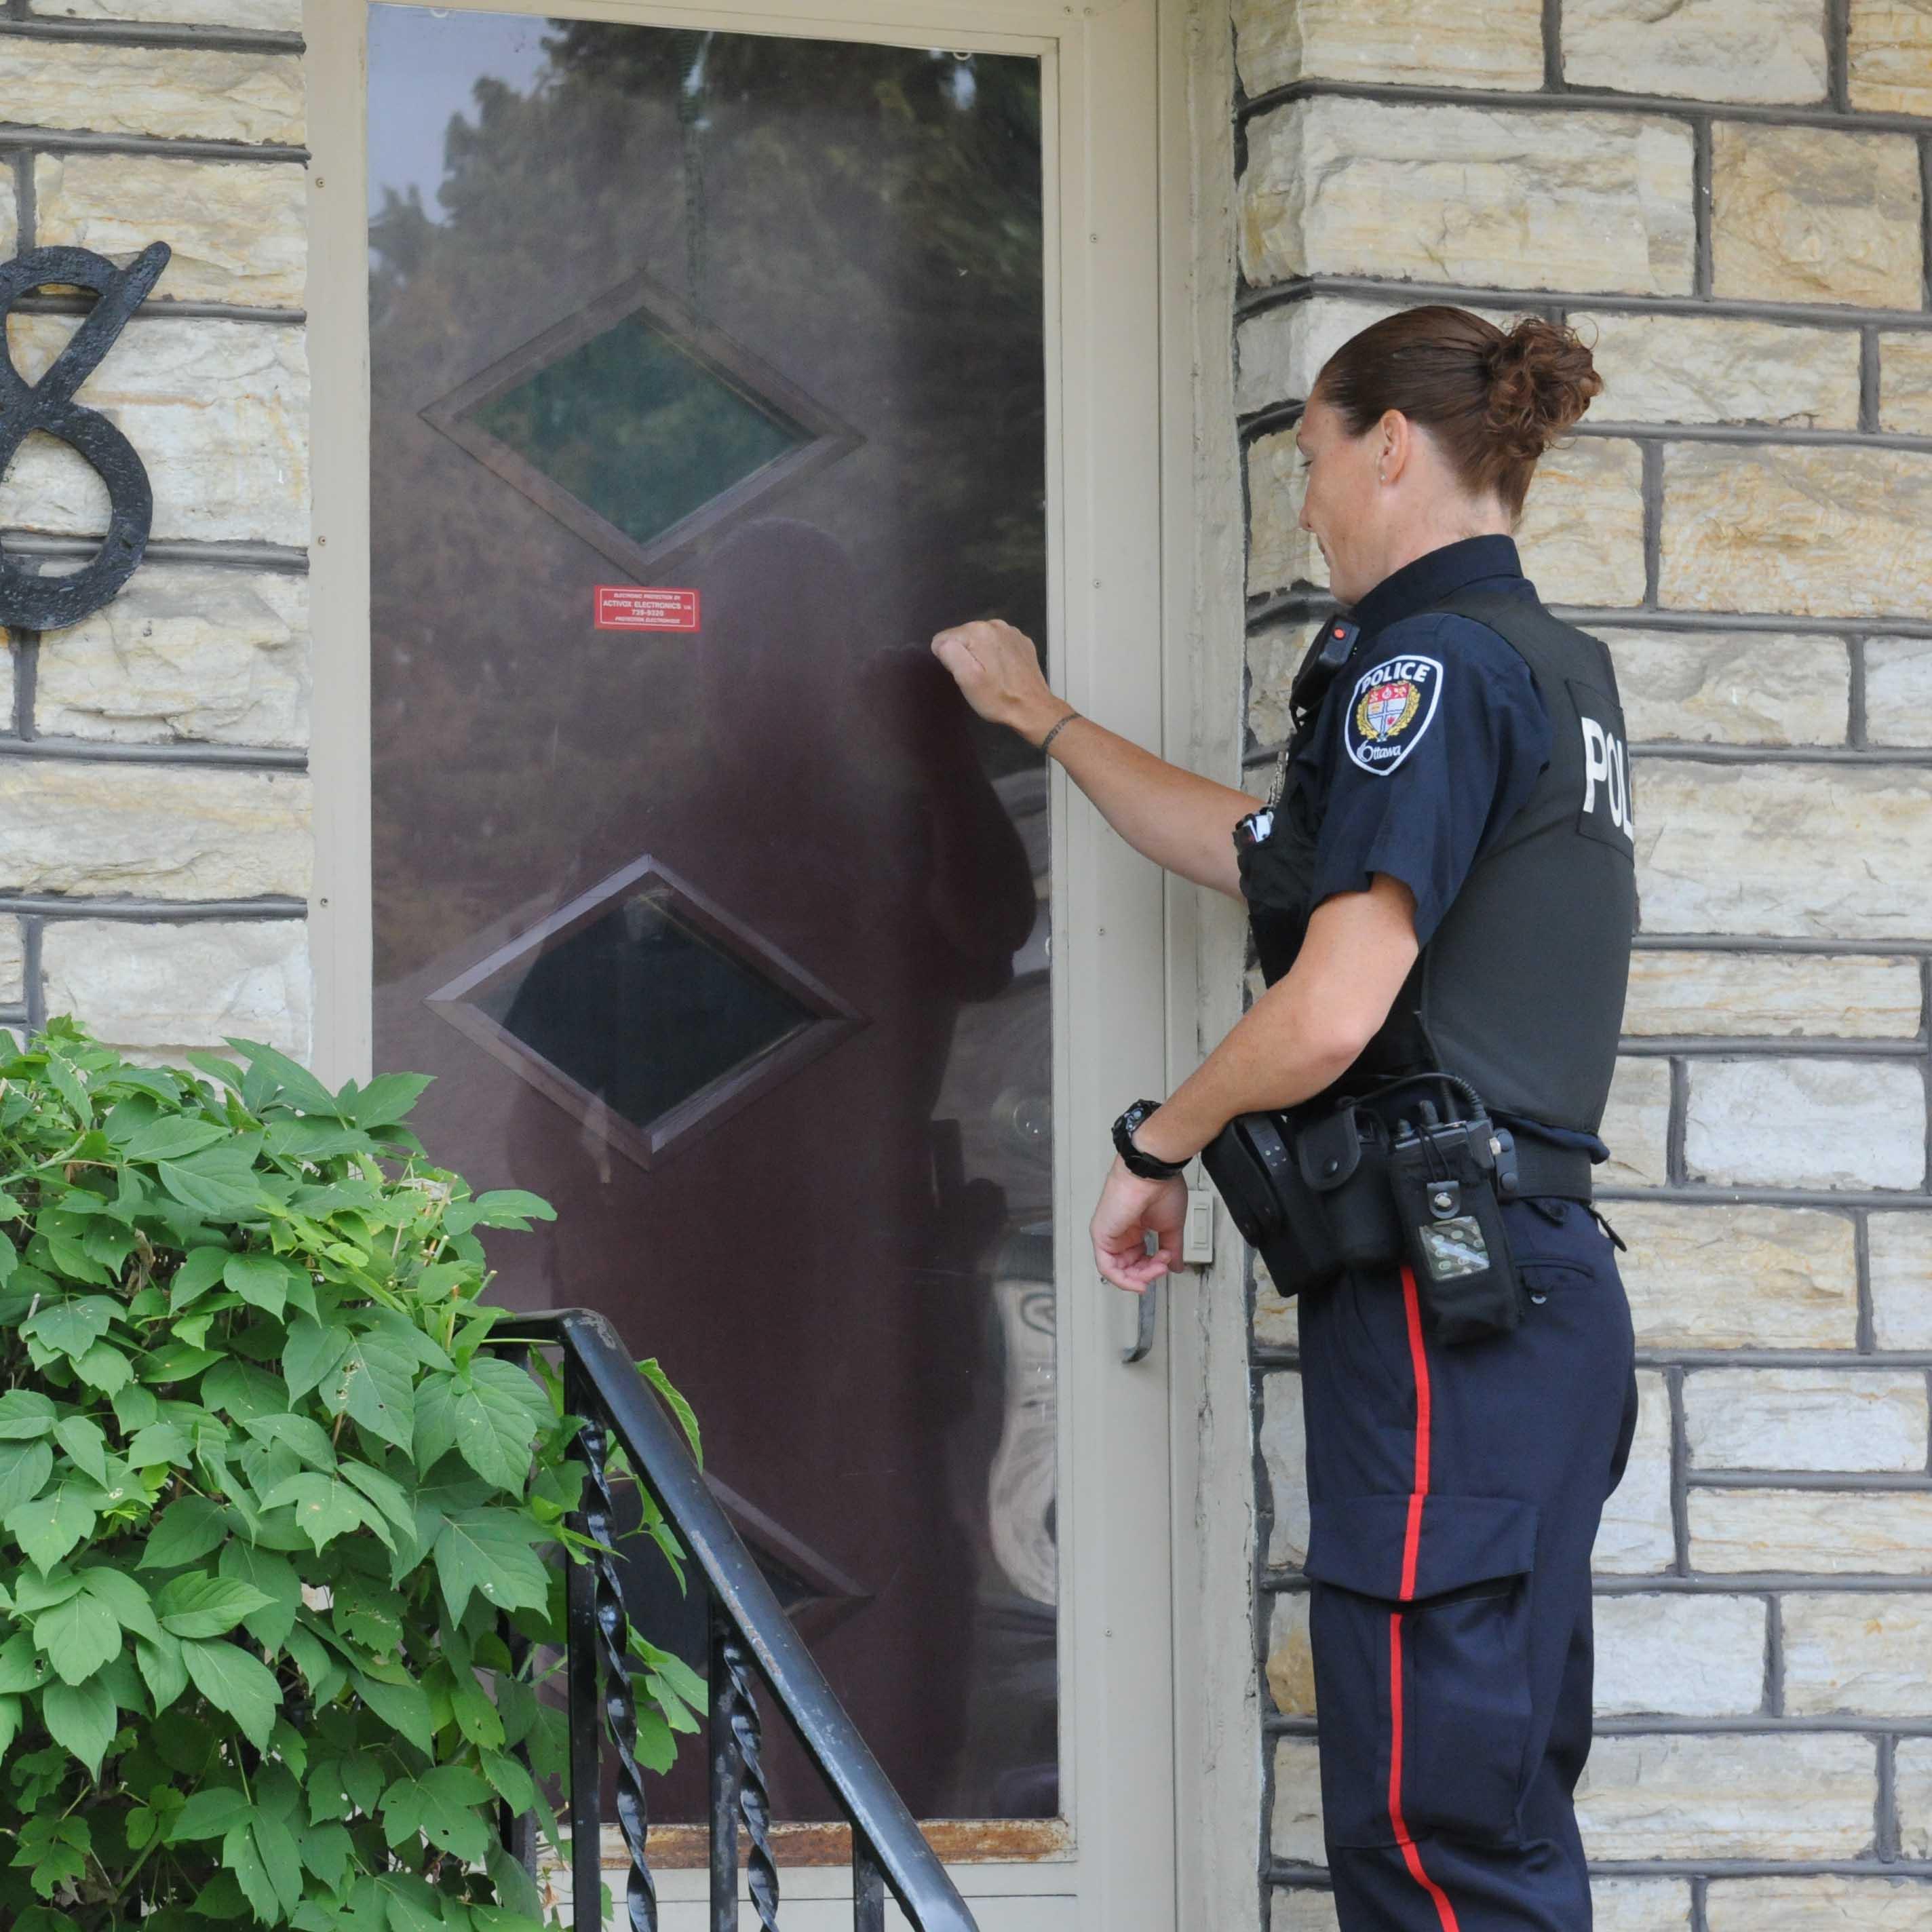 OPS officer at a door